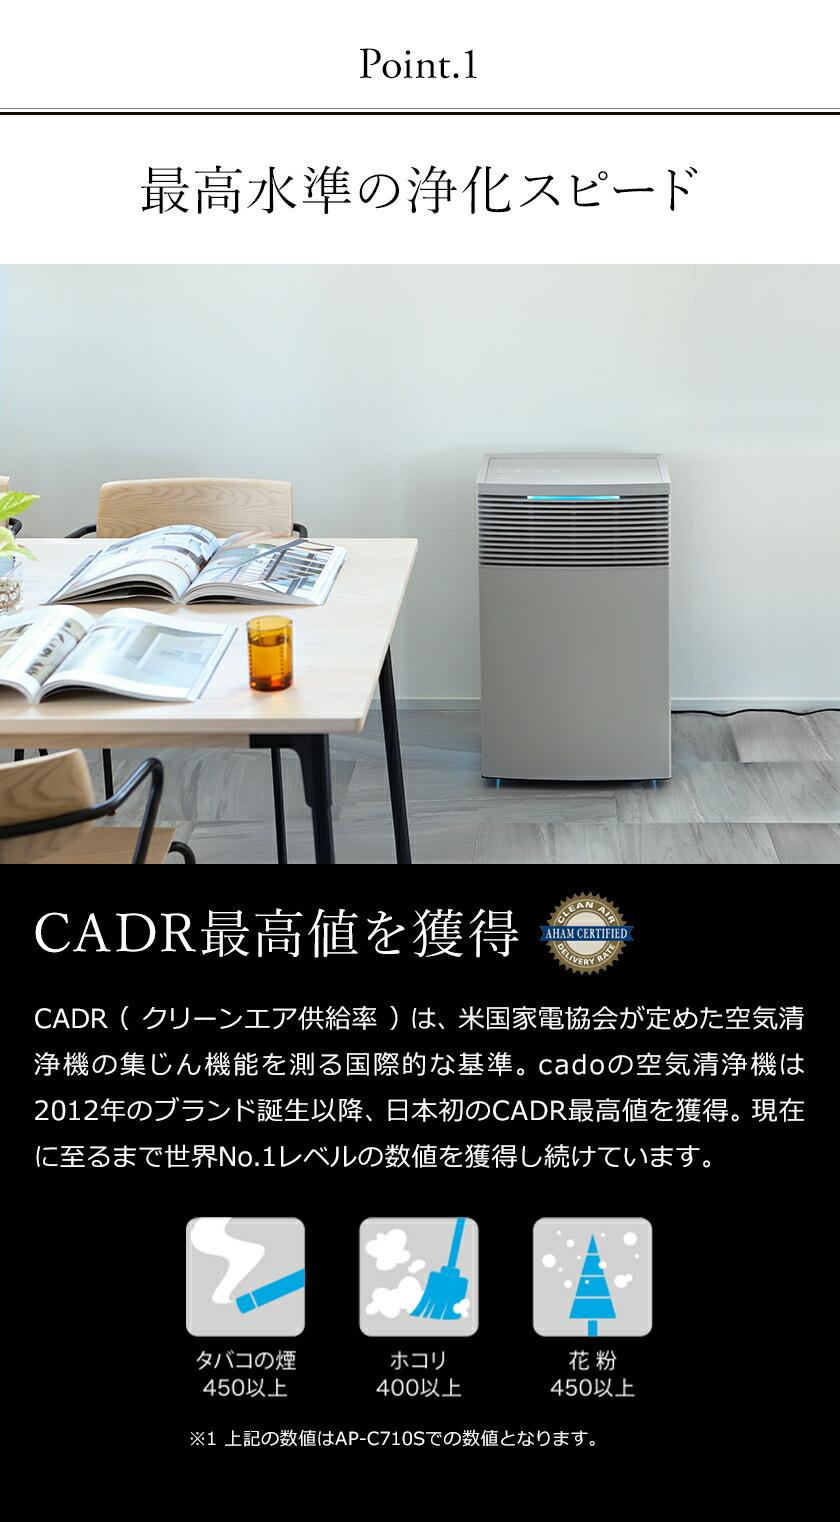 CADR最高値を獲得した空気清浄機